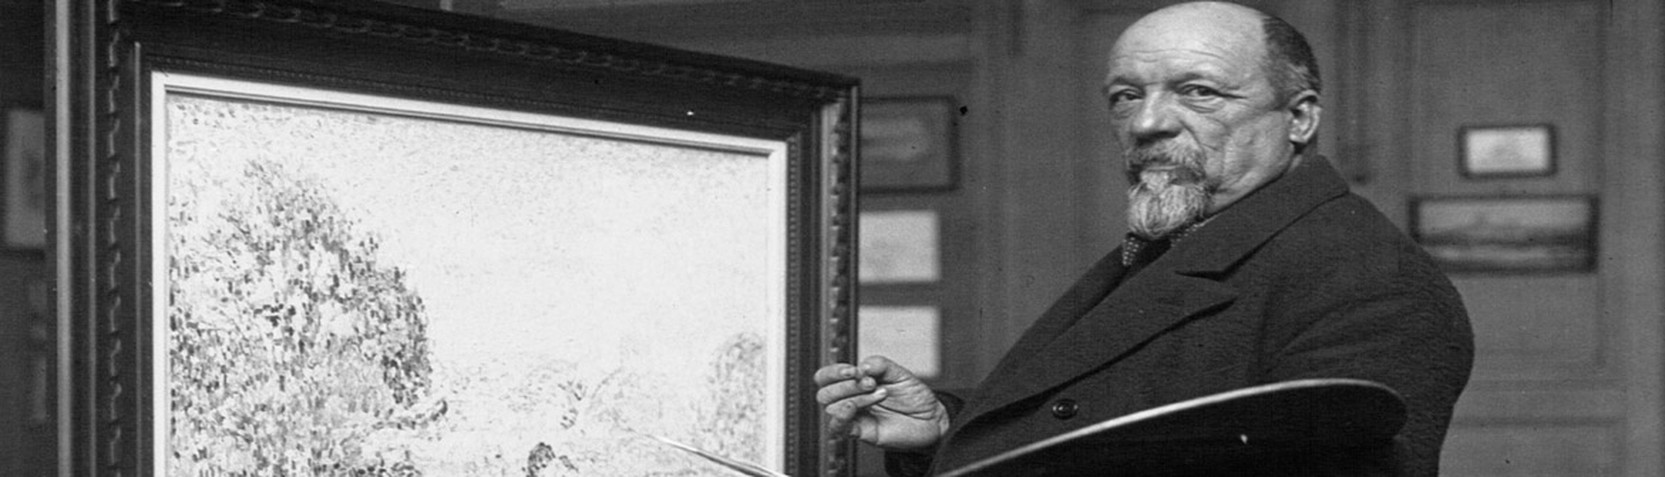 Artistas - Paul Signac